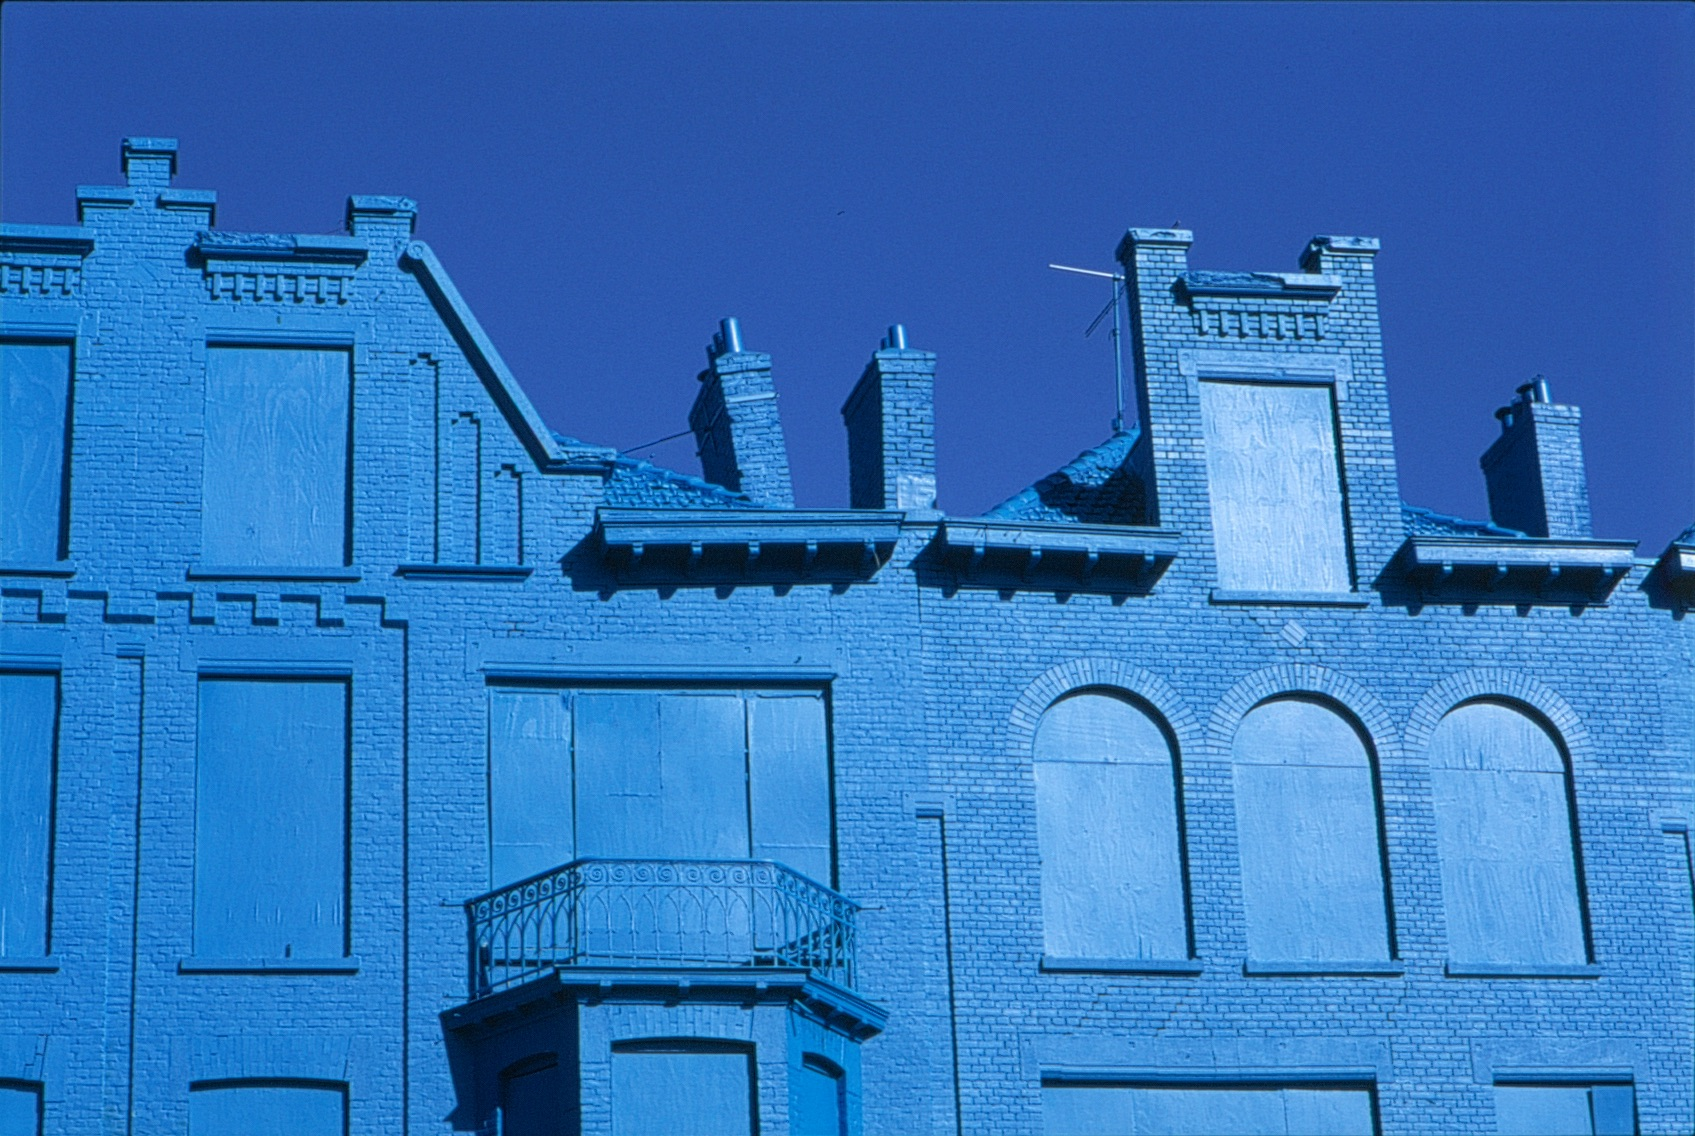 Beukelsblauw in Rotterdam by Florentijn Hofman